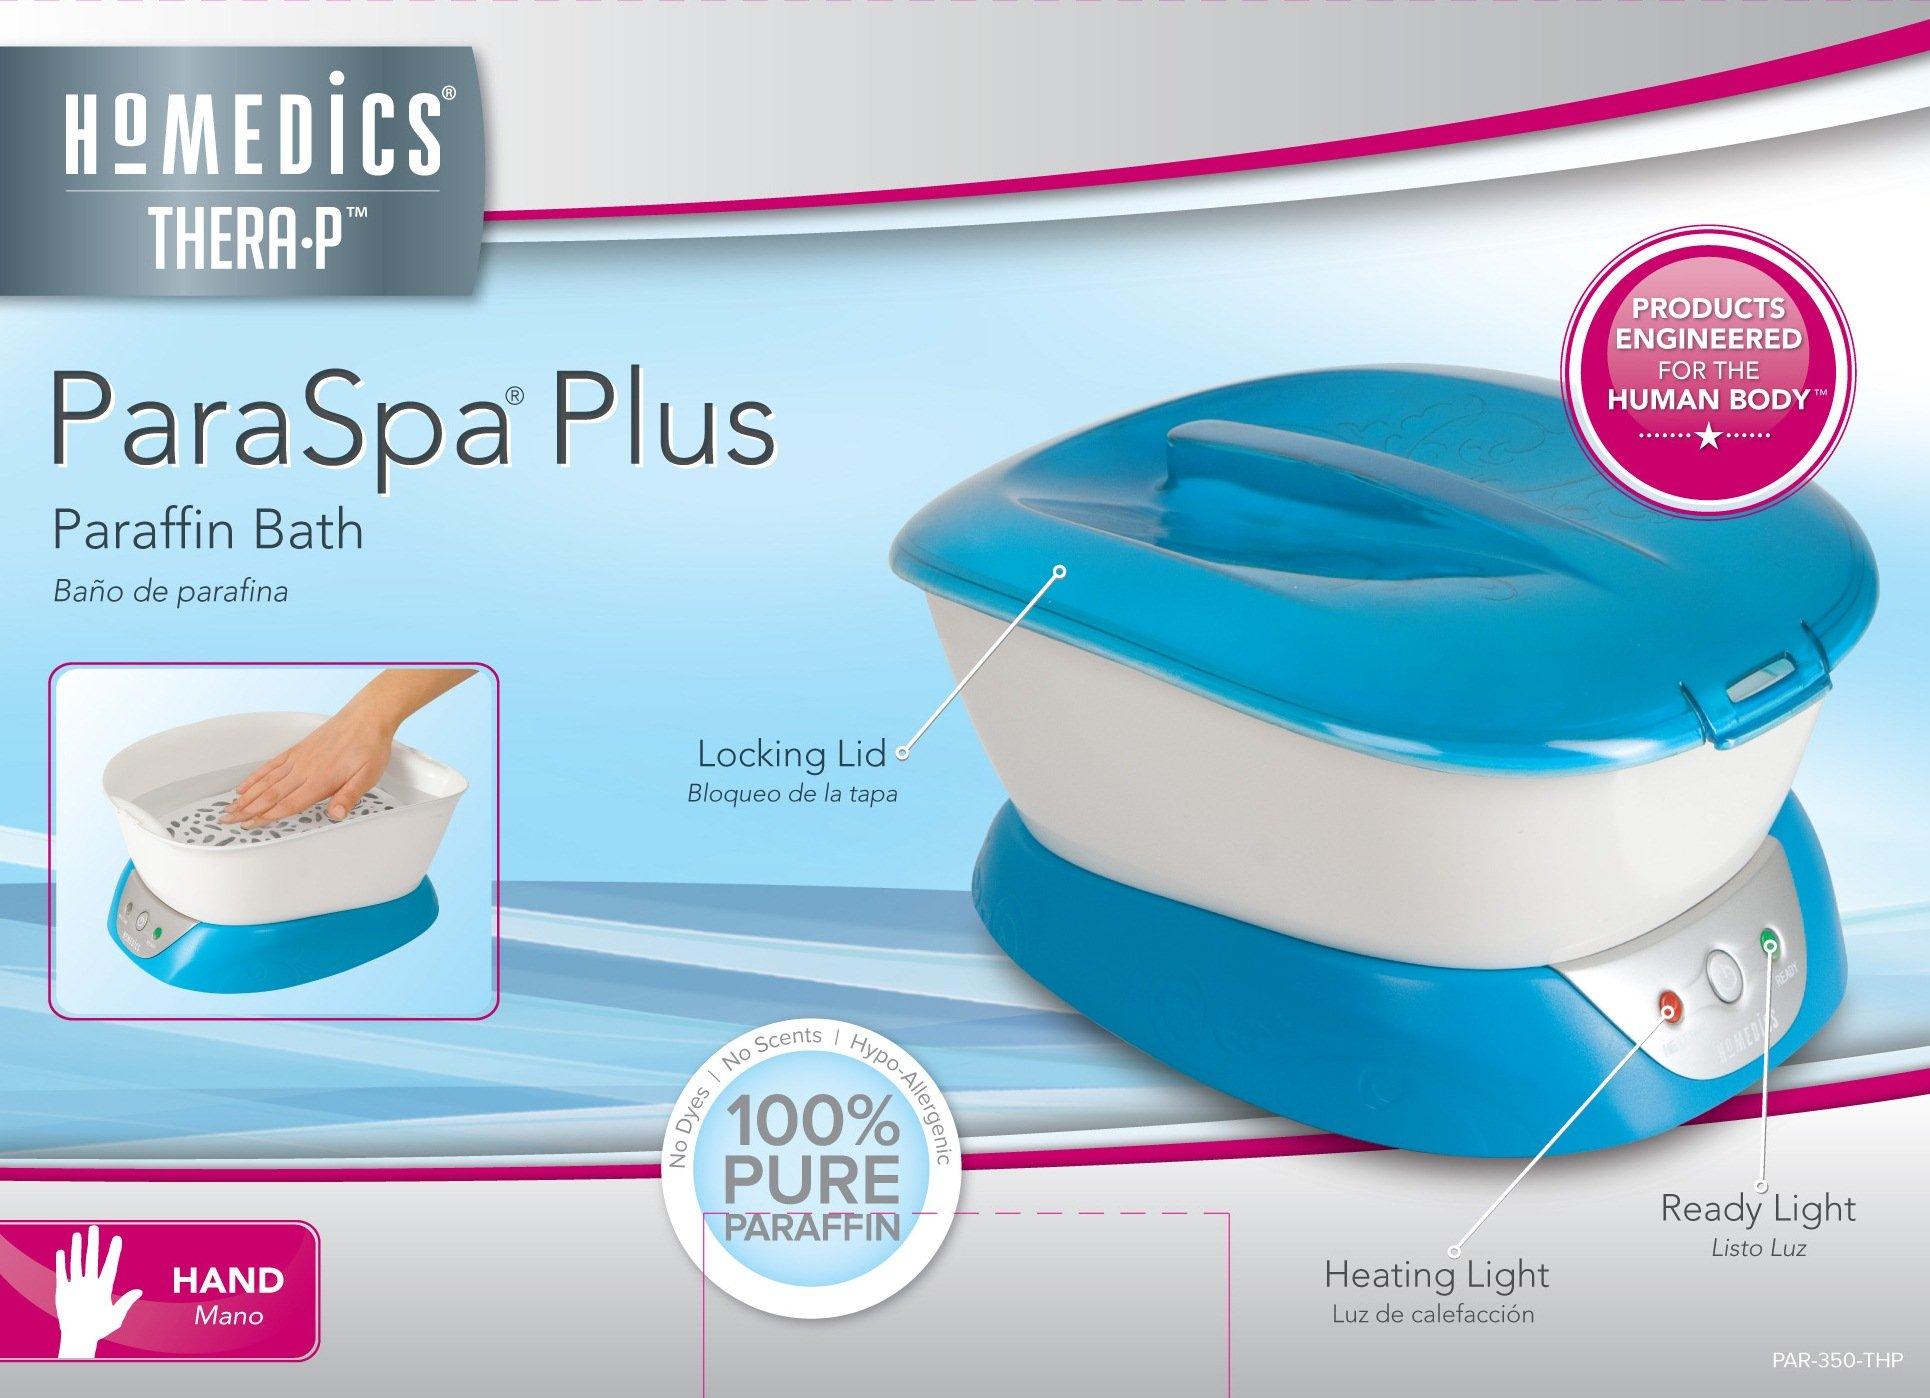 HoMedics Thera-P Paraspa Plus Paraffin Bath by Homedics (Image #3)